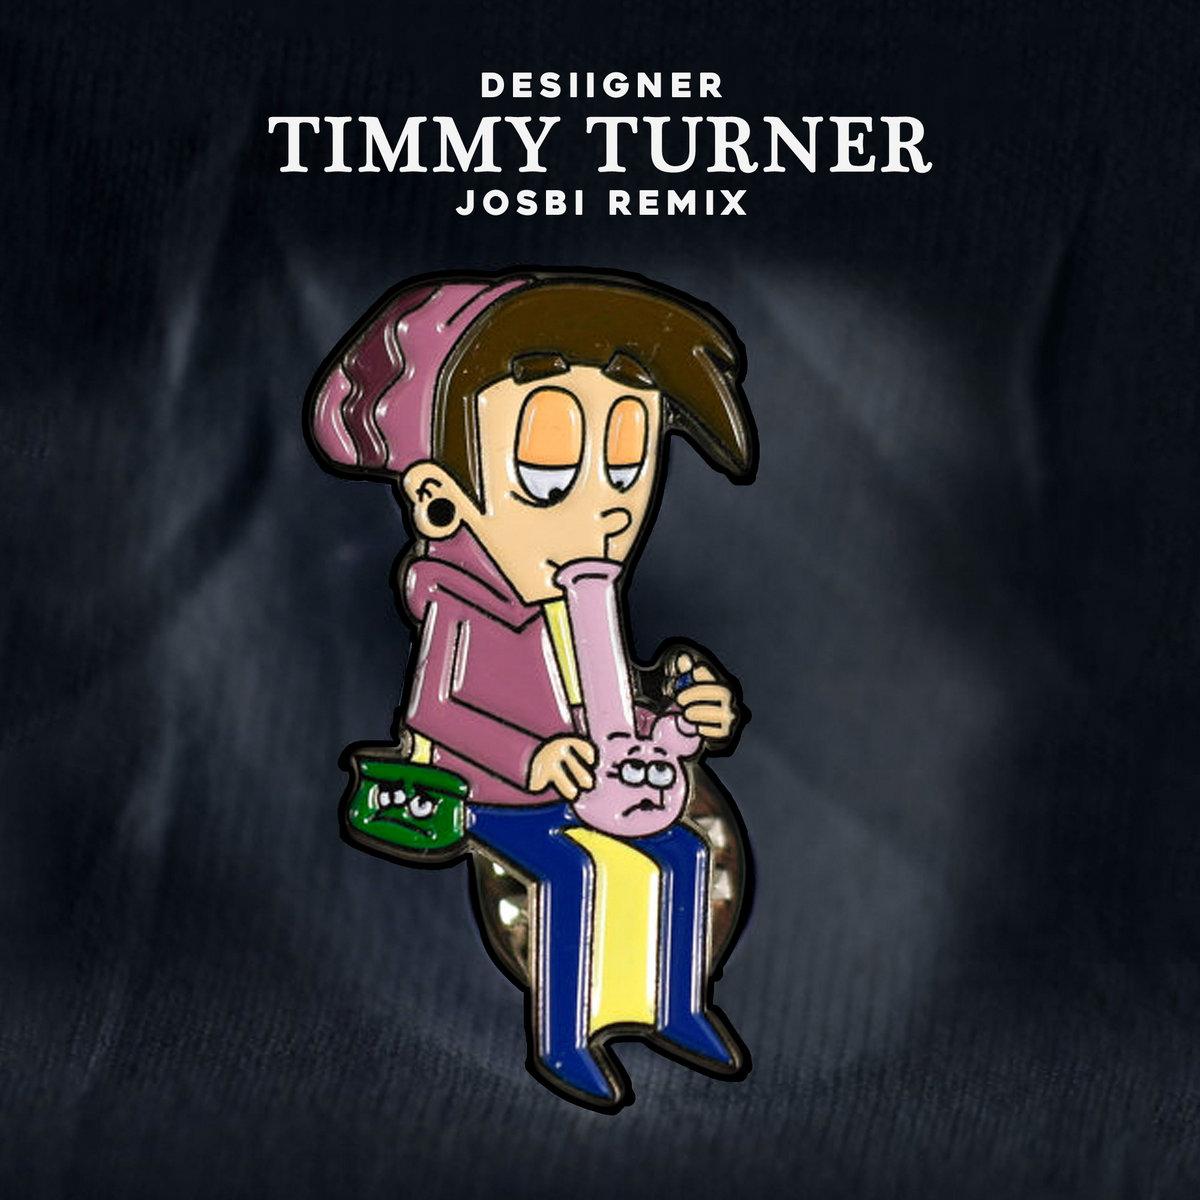 Timoteo Ta Doidao Timmy Turner Remix Josbi